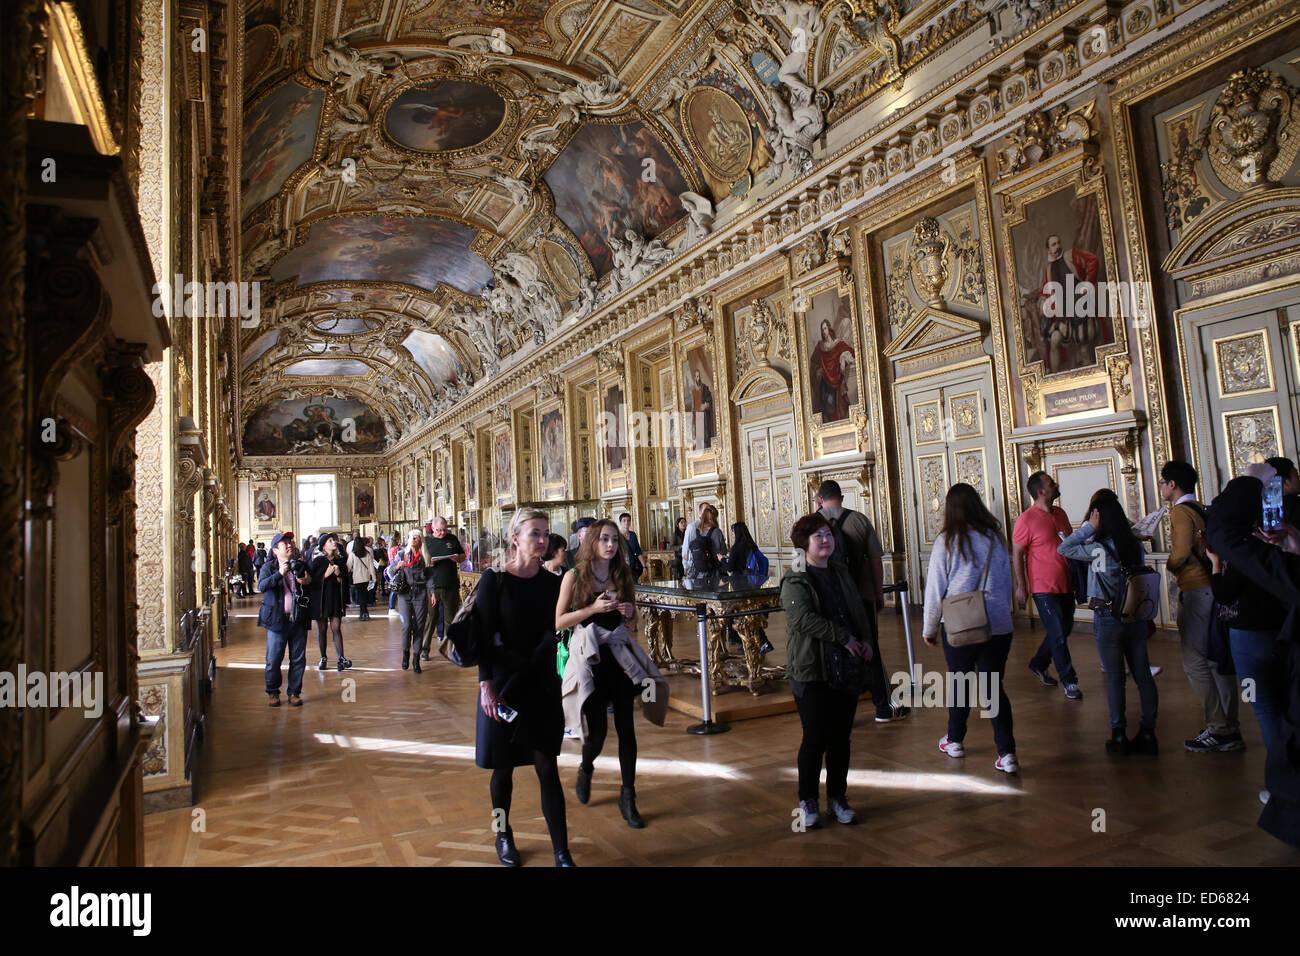 crowd people inside Galerie d'Apollon - Stock Image